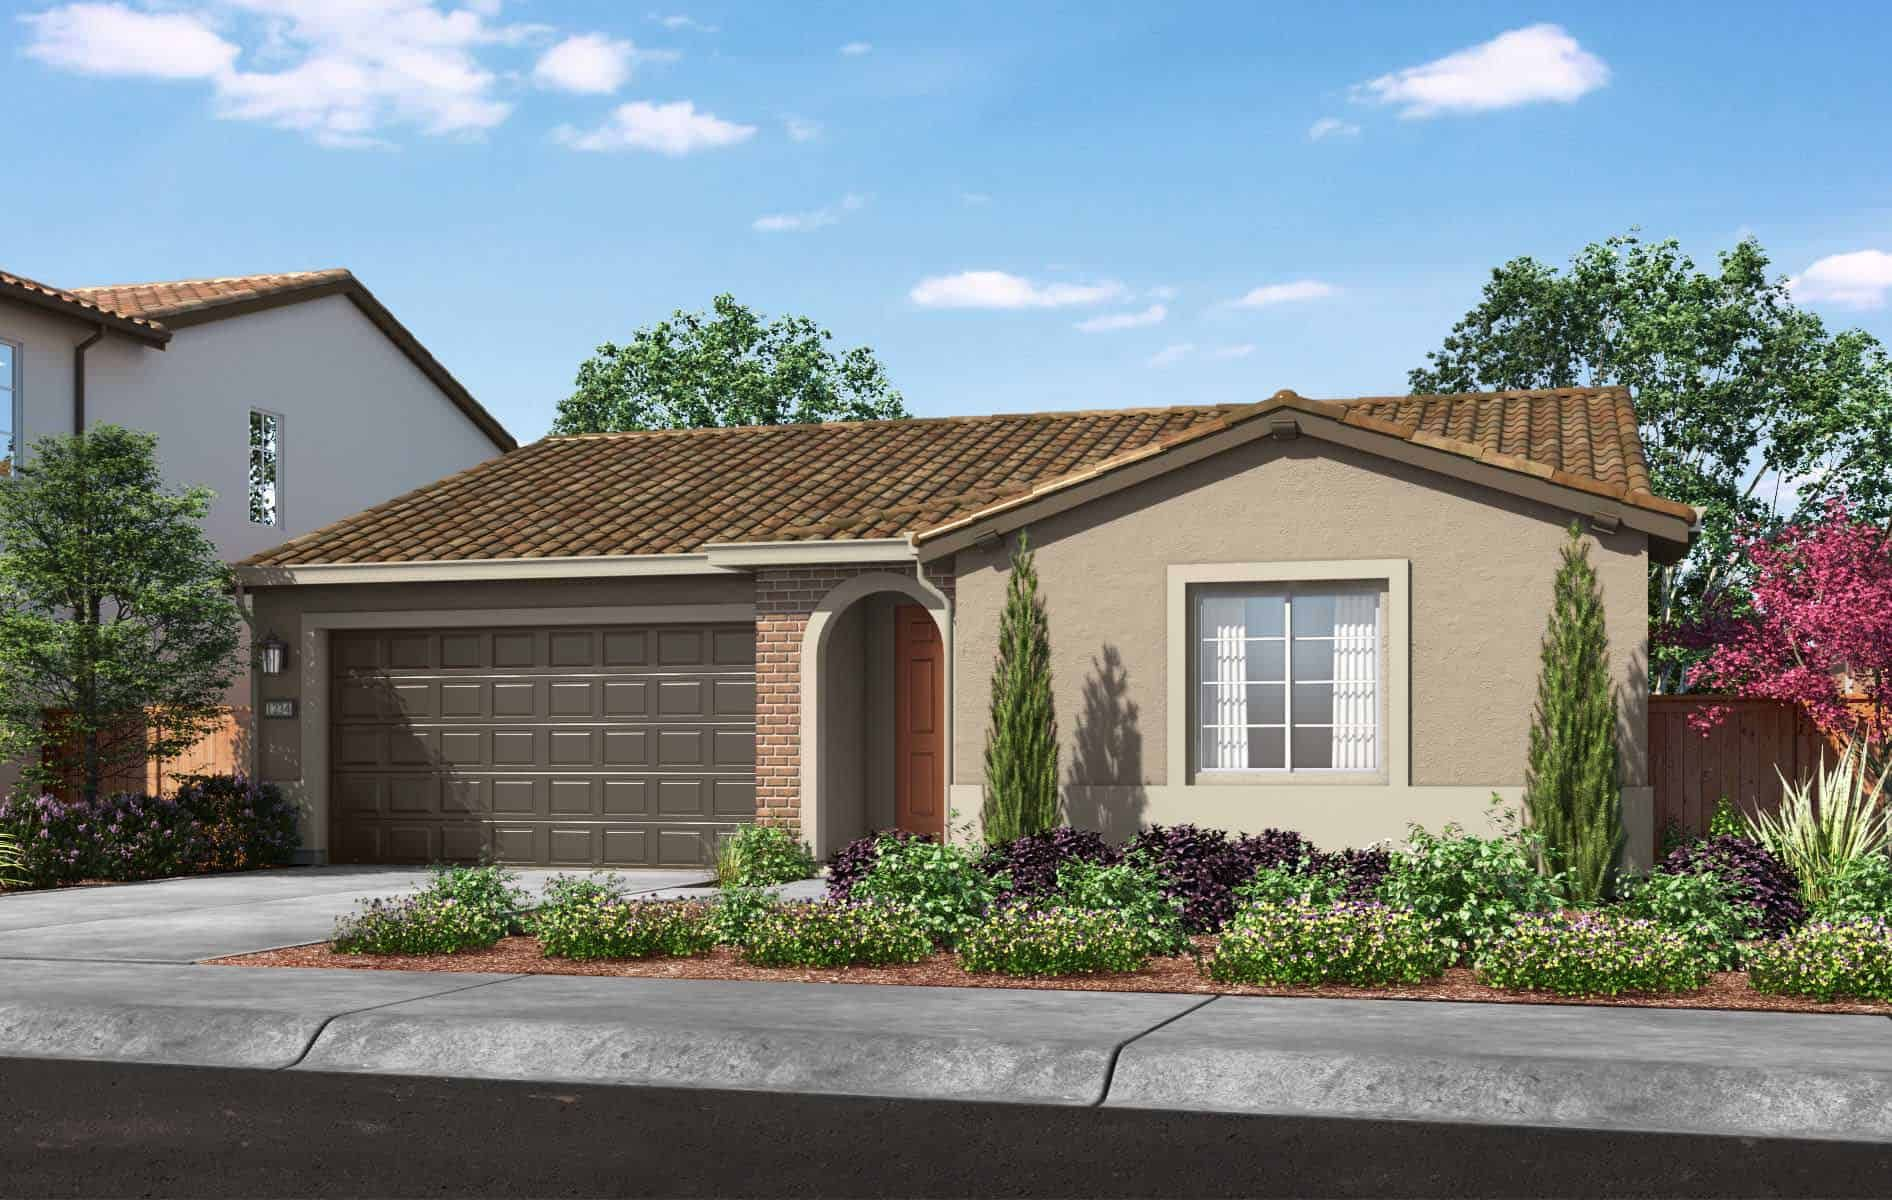 Plan 1 Exterior Style: Adobe Ranch